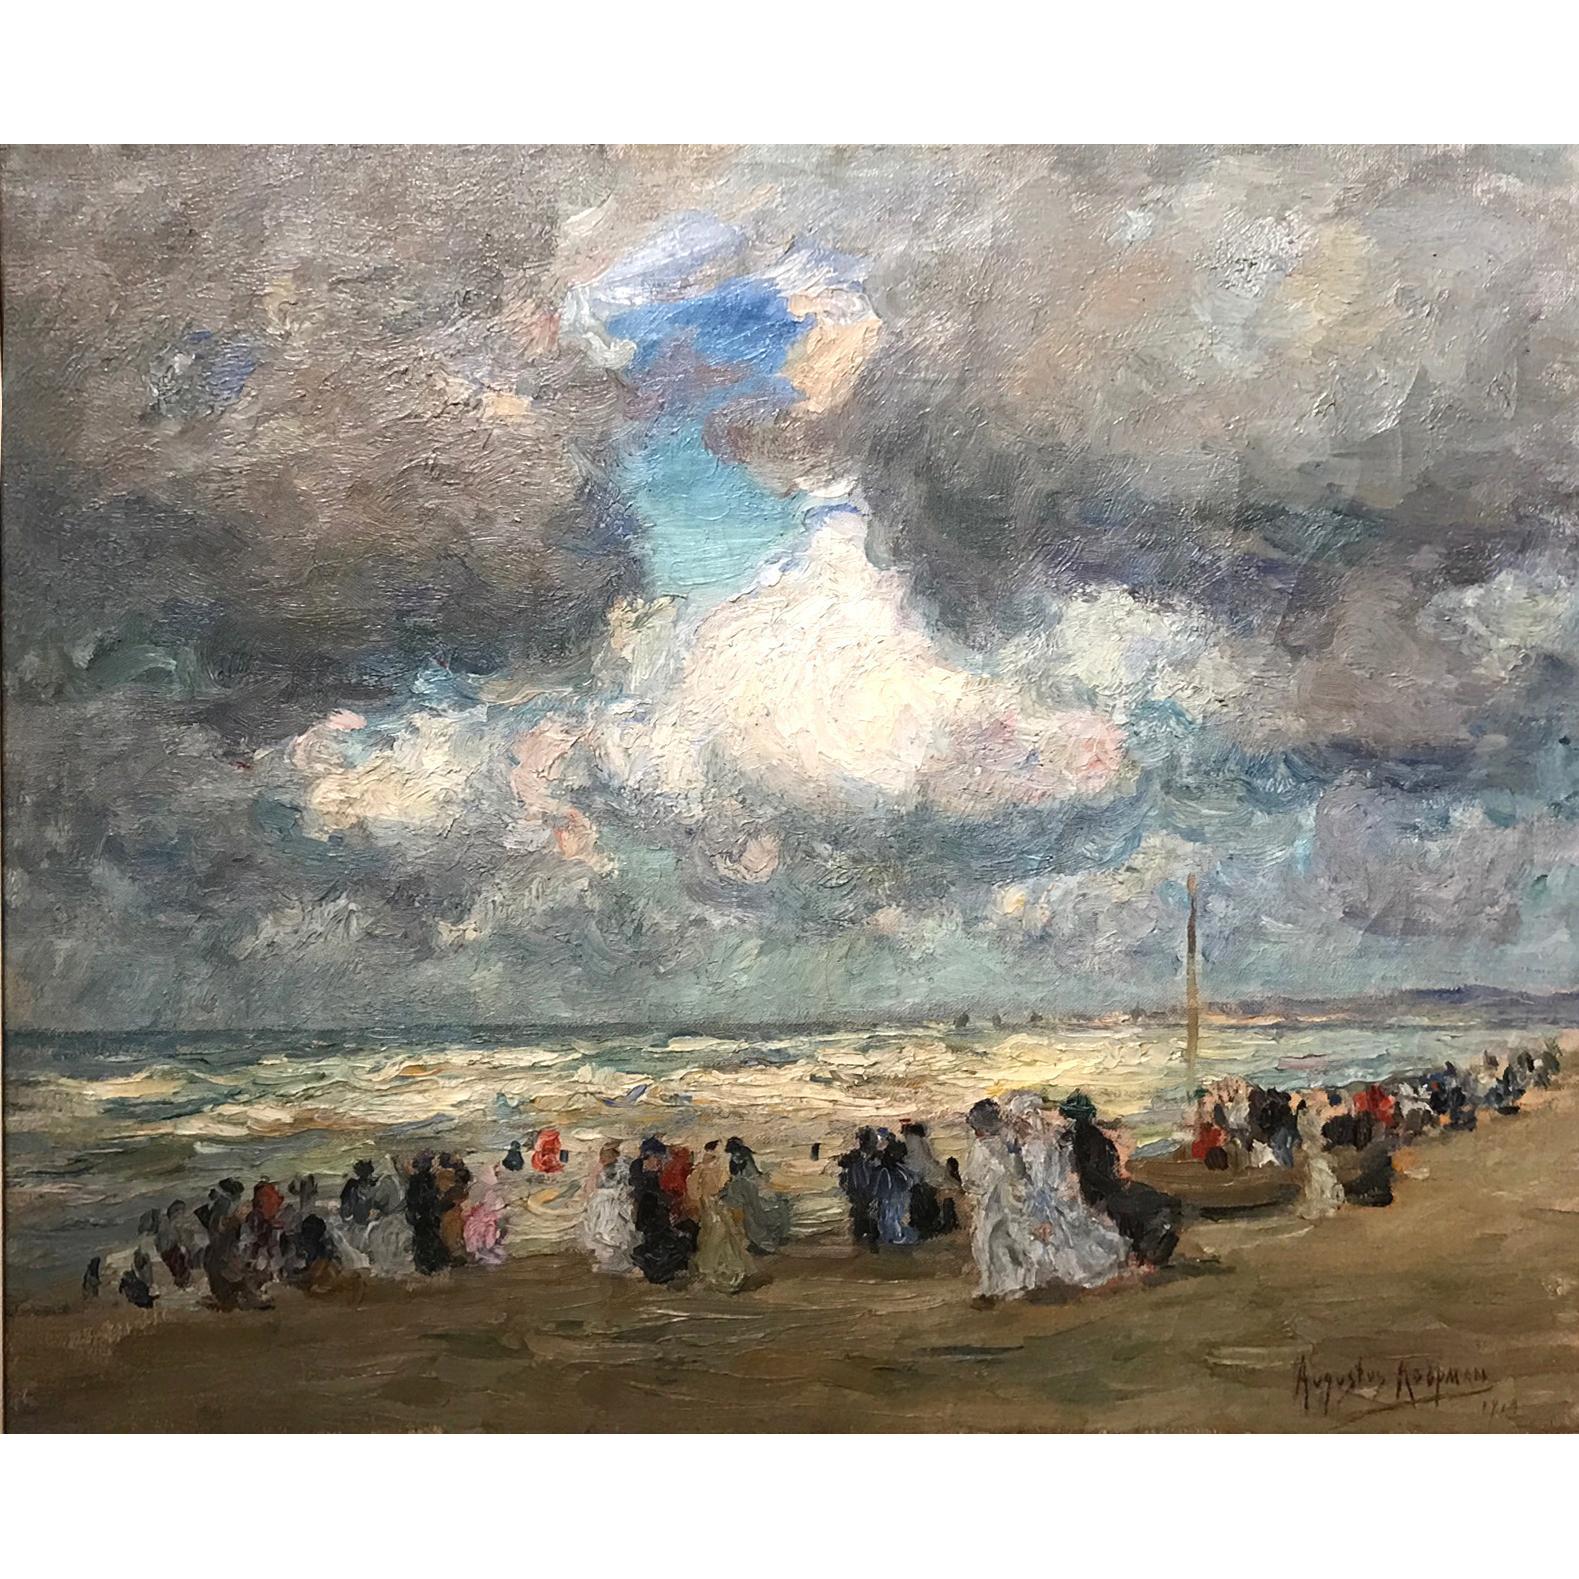 Augustus B. Koopman Coastal Impressionist Oil Painting - A Day At The Beach 1914